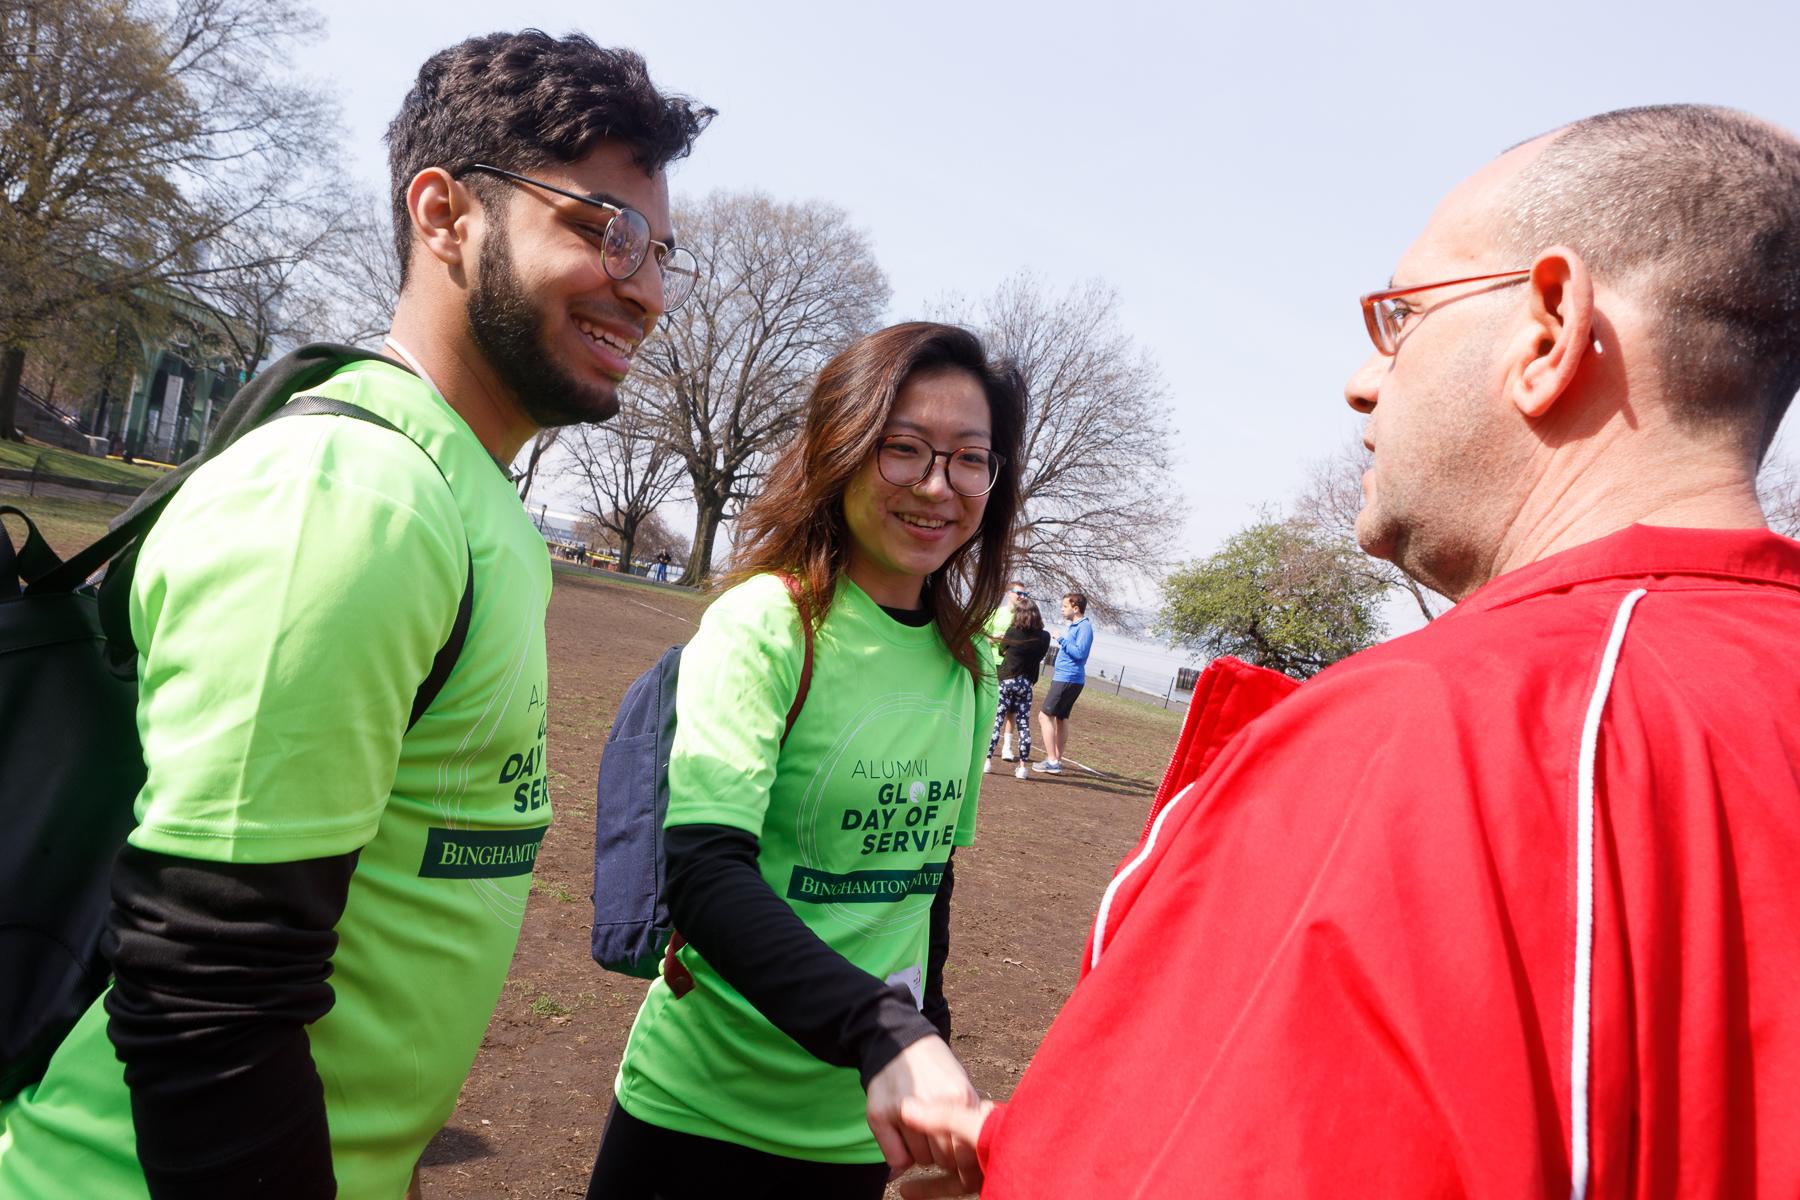 Alumni Global Day of Service - Binghamton University 2019 _ Jonathan Heisler _ 4132019 _014.jpg